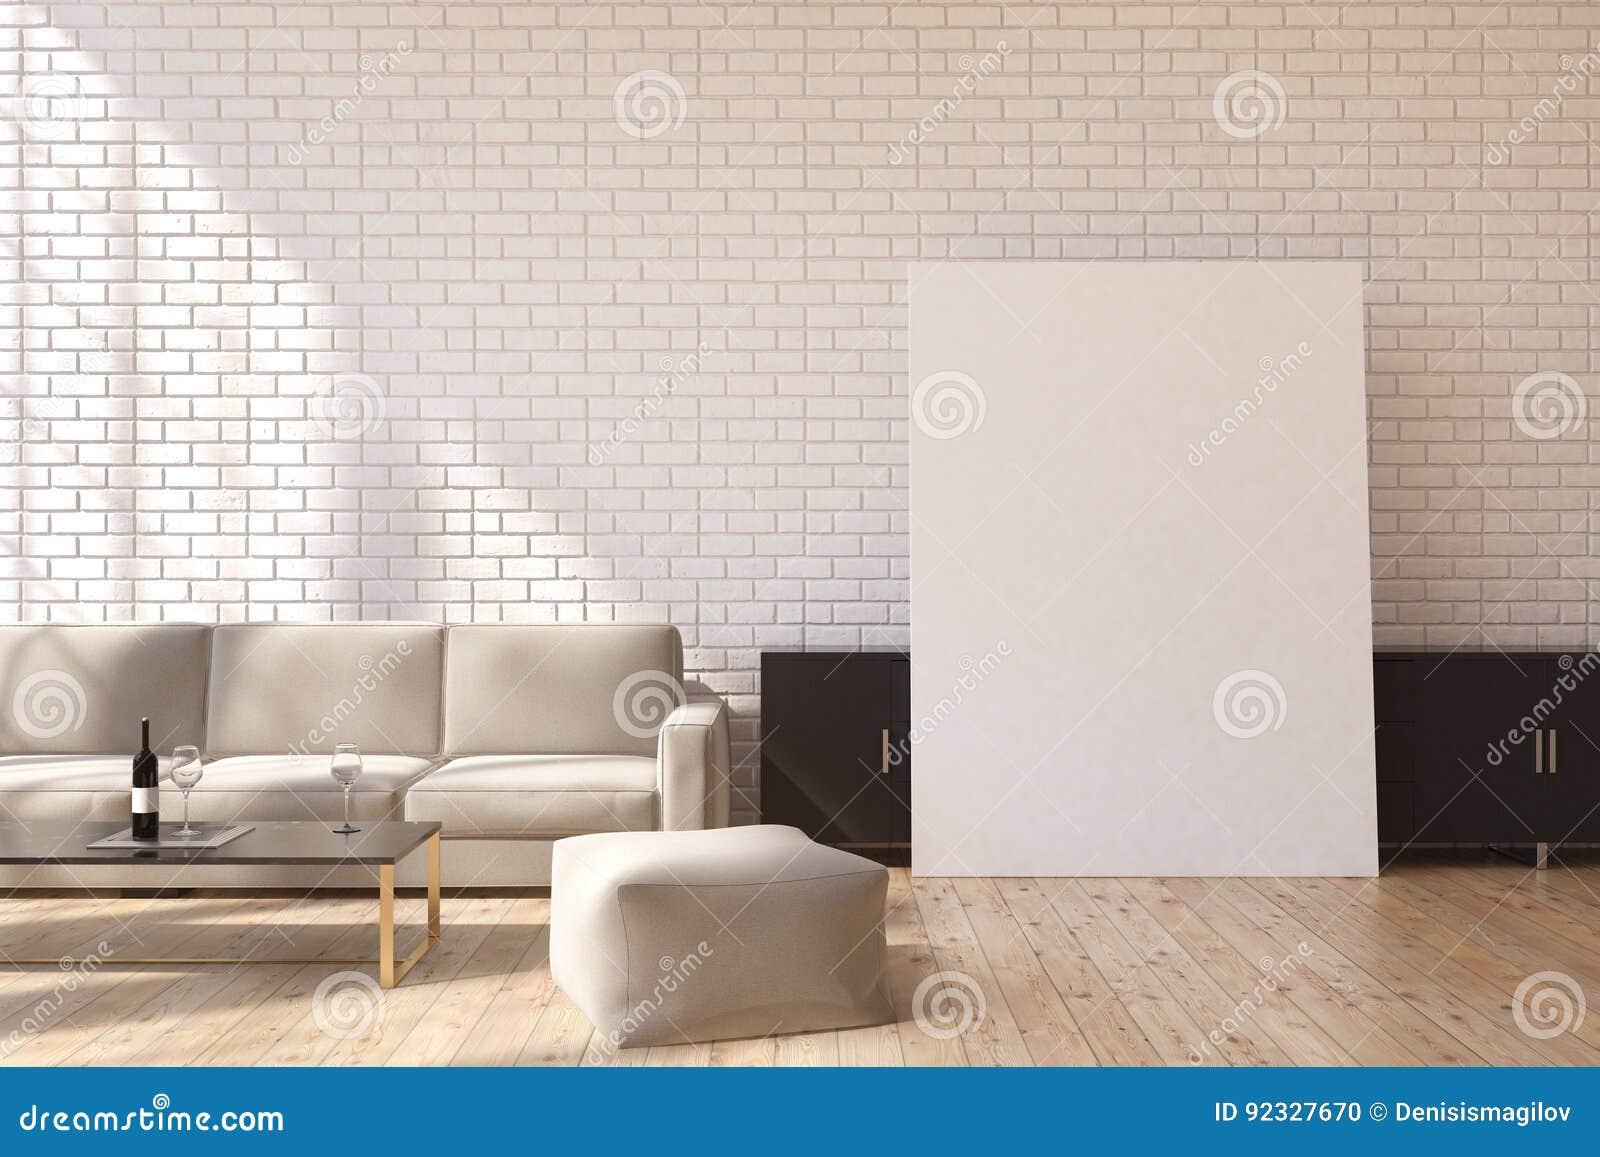 Gray sofa and poster